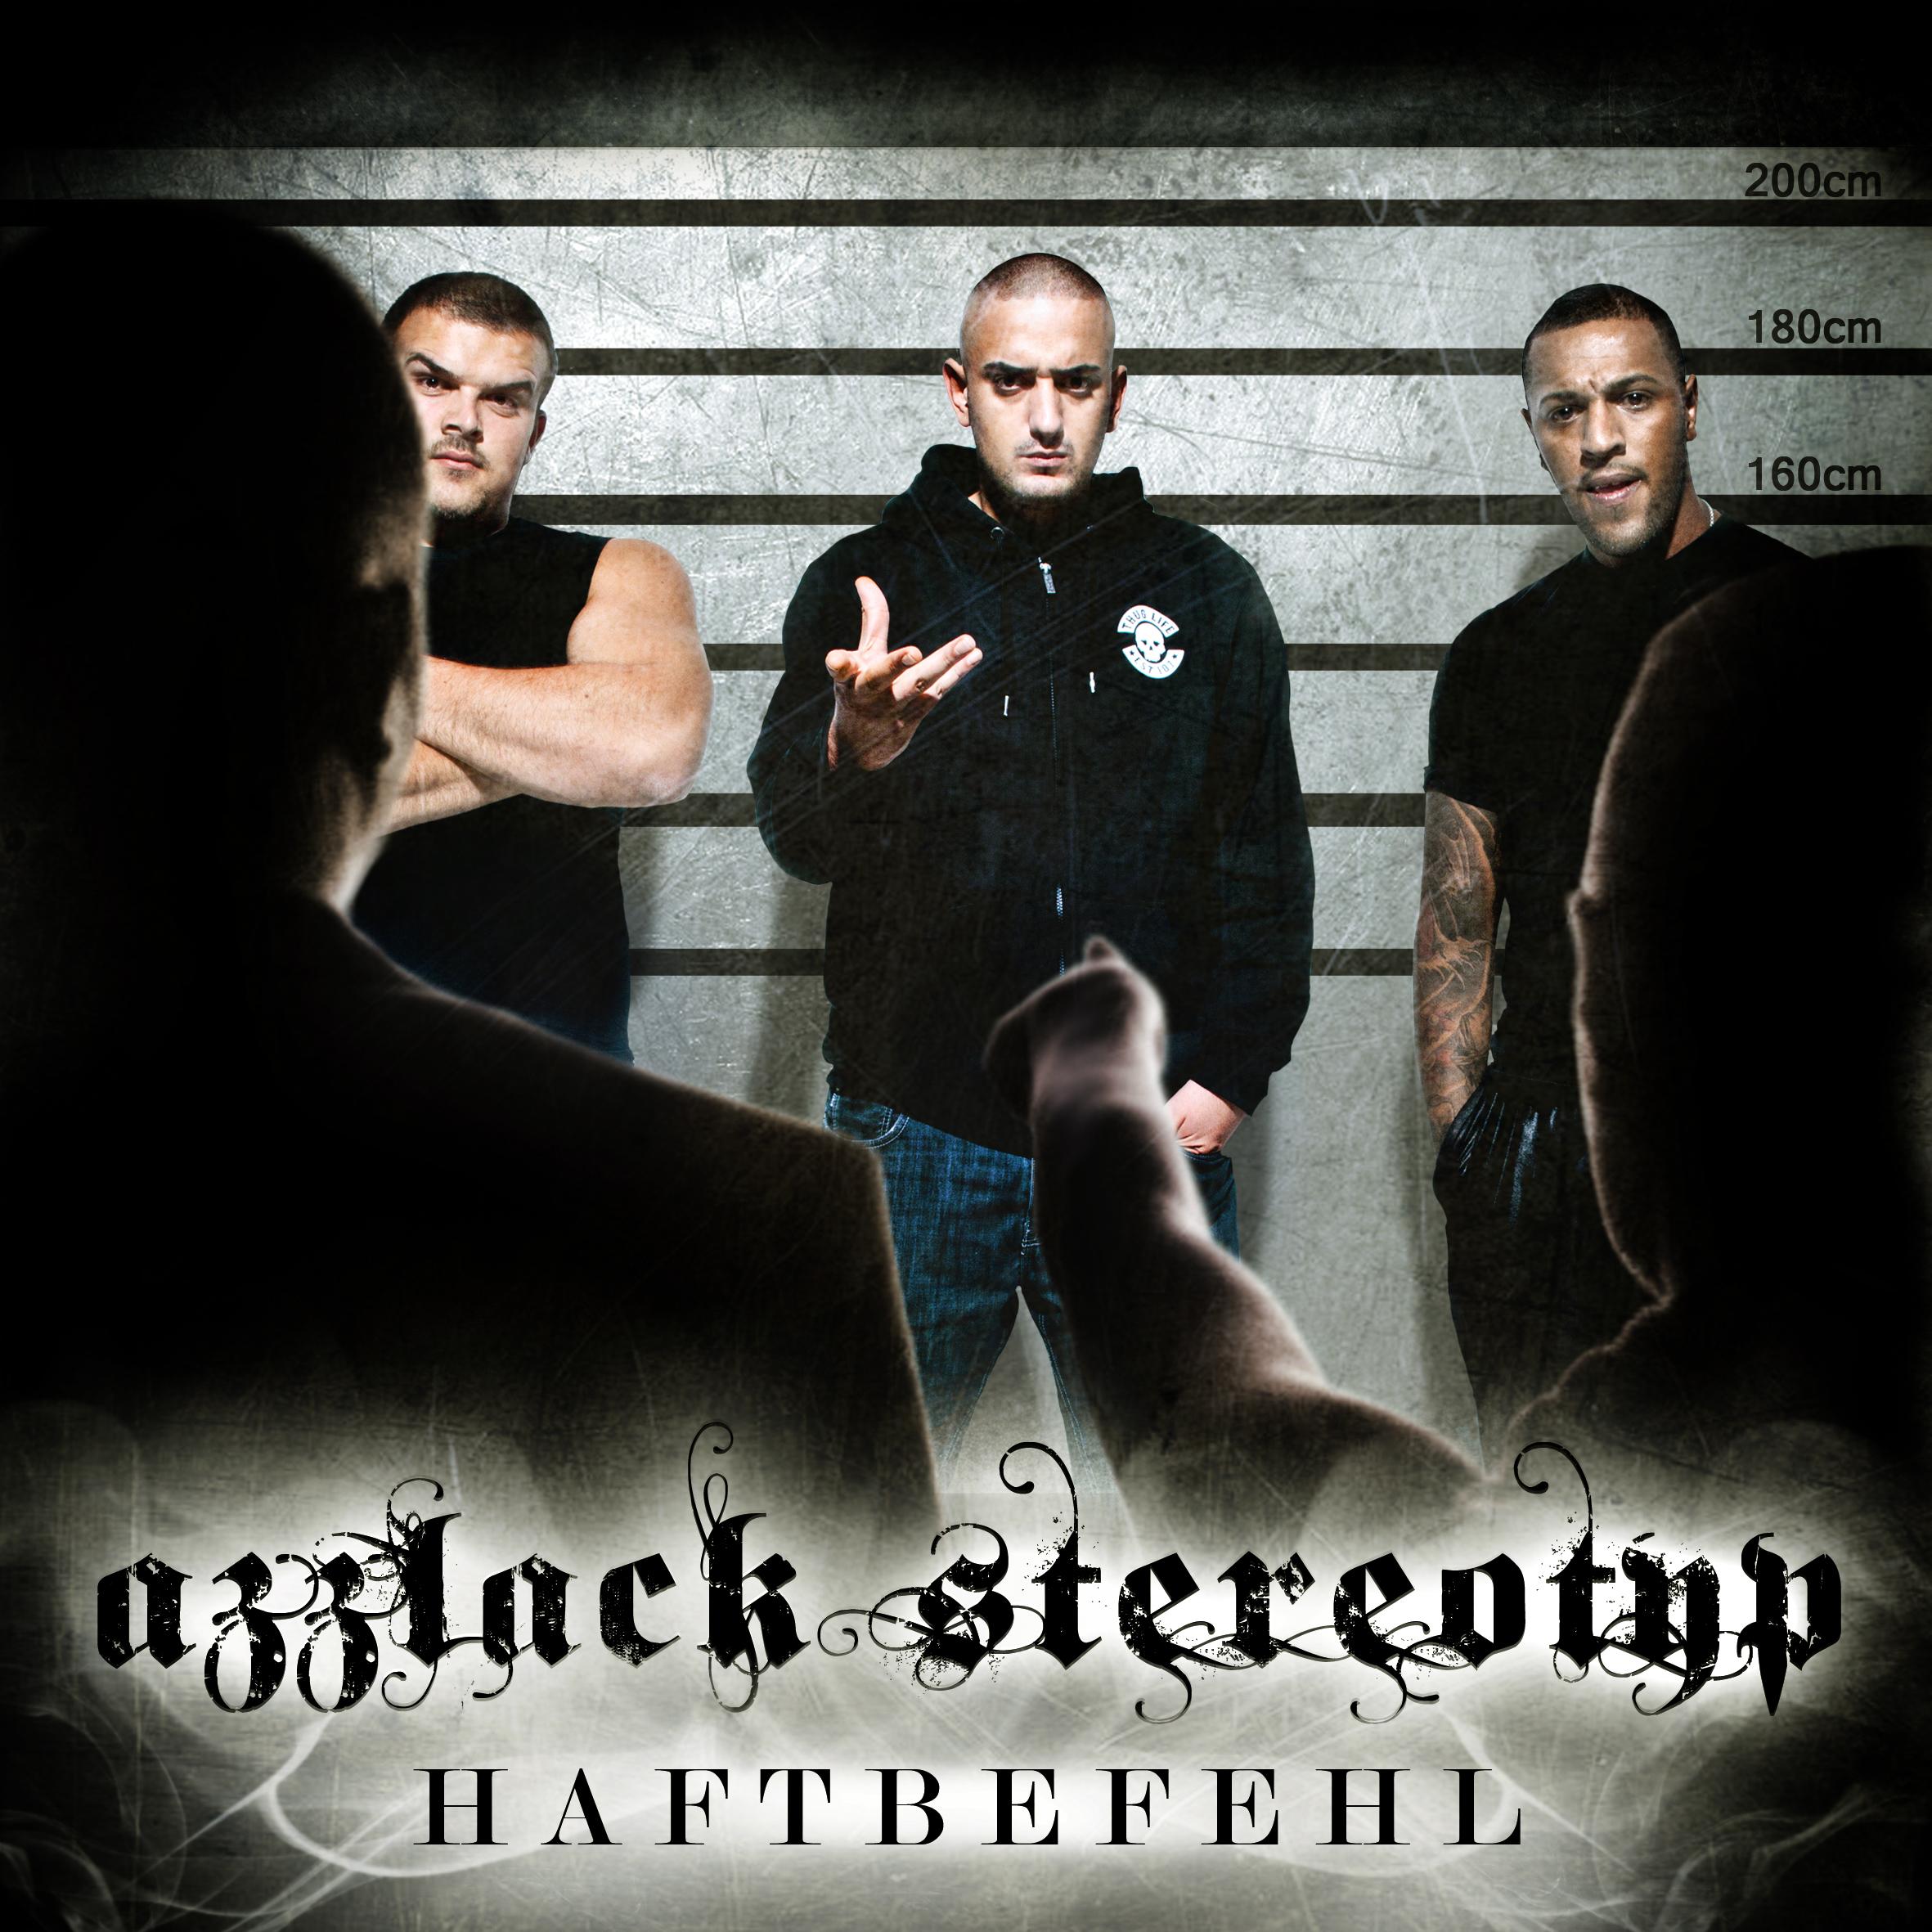 Haftbefehl-Azzlack Stereotyp-2CD-DE-2010